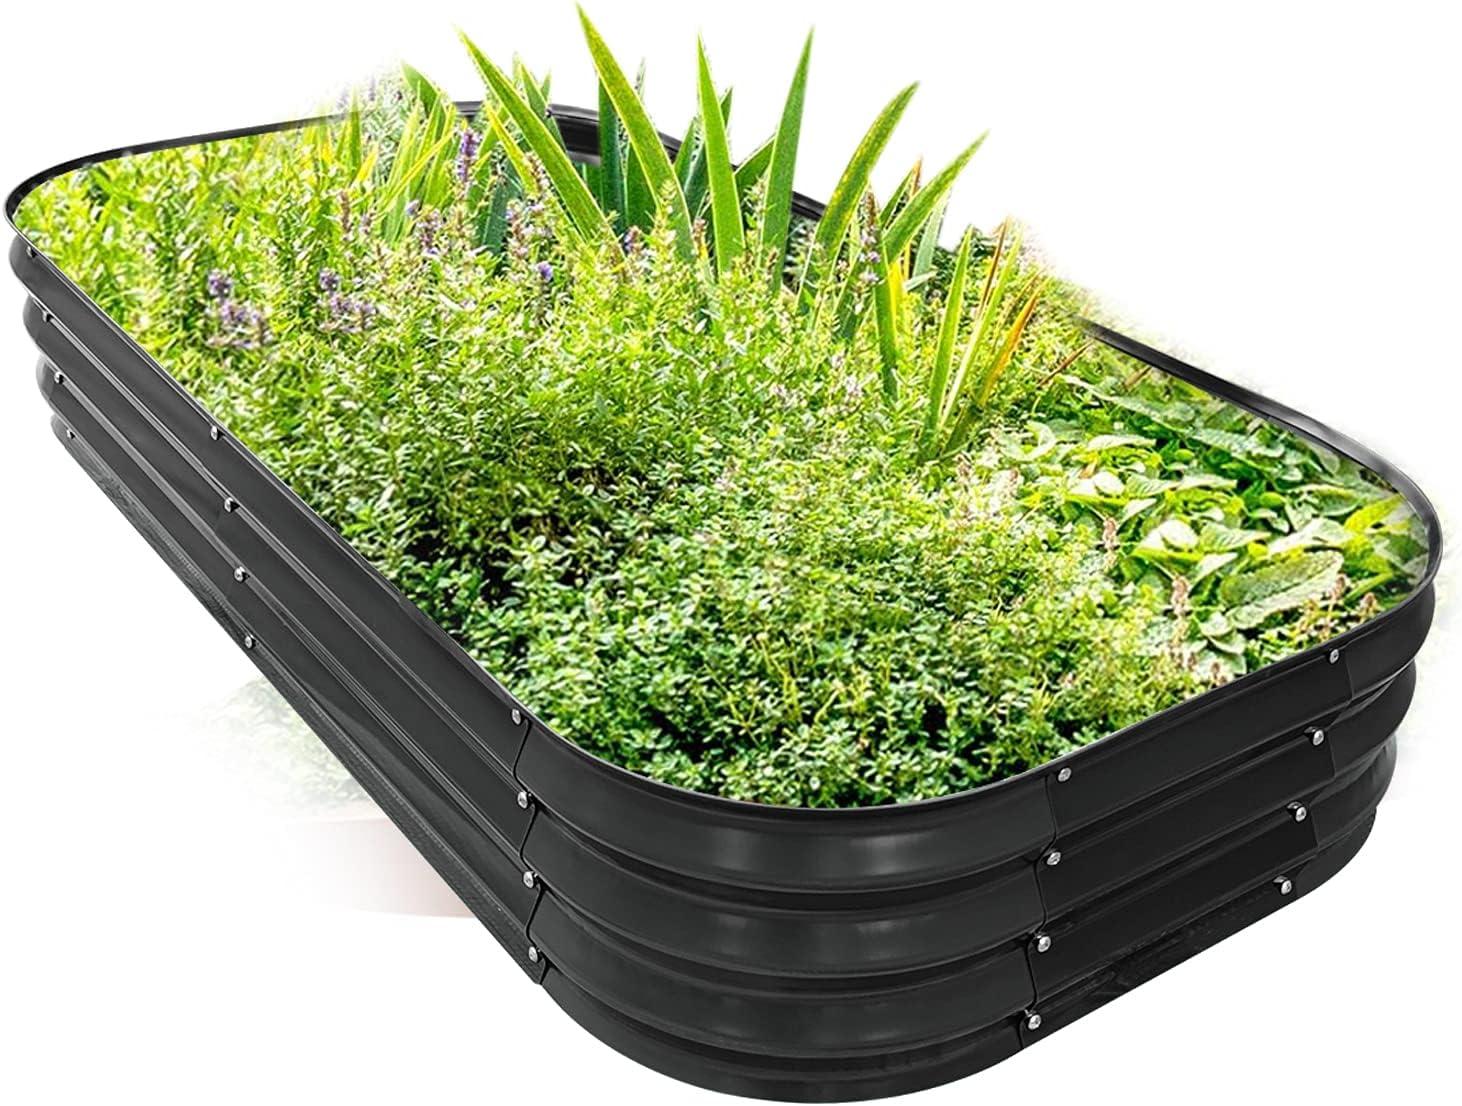 PINTIA1 Steel Raised Garden Beds for Vegetables Flowers, Large Outdoor Planter Herbs Garden Bed Galvanised Steel Size (6X3X1 FT, Charcoal Grey)